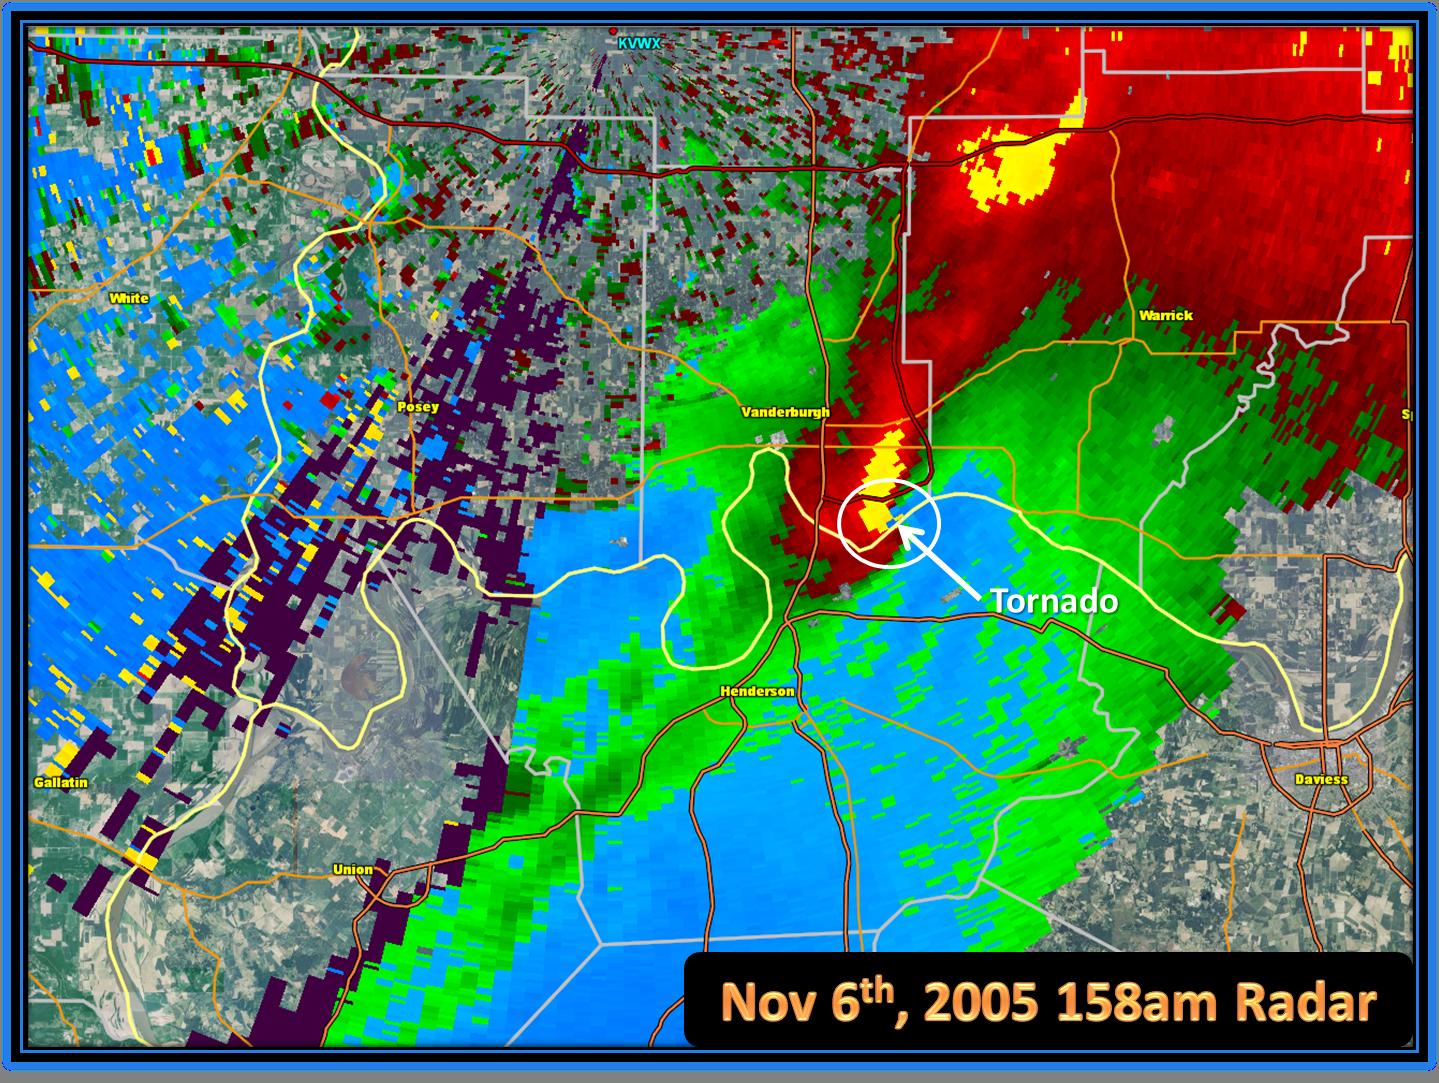 Evansville Area F3 Tornado – November 6, 2005